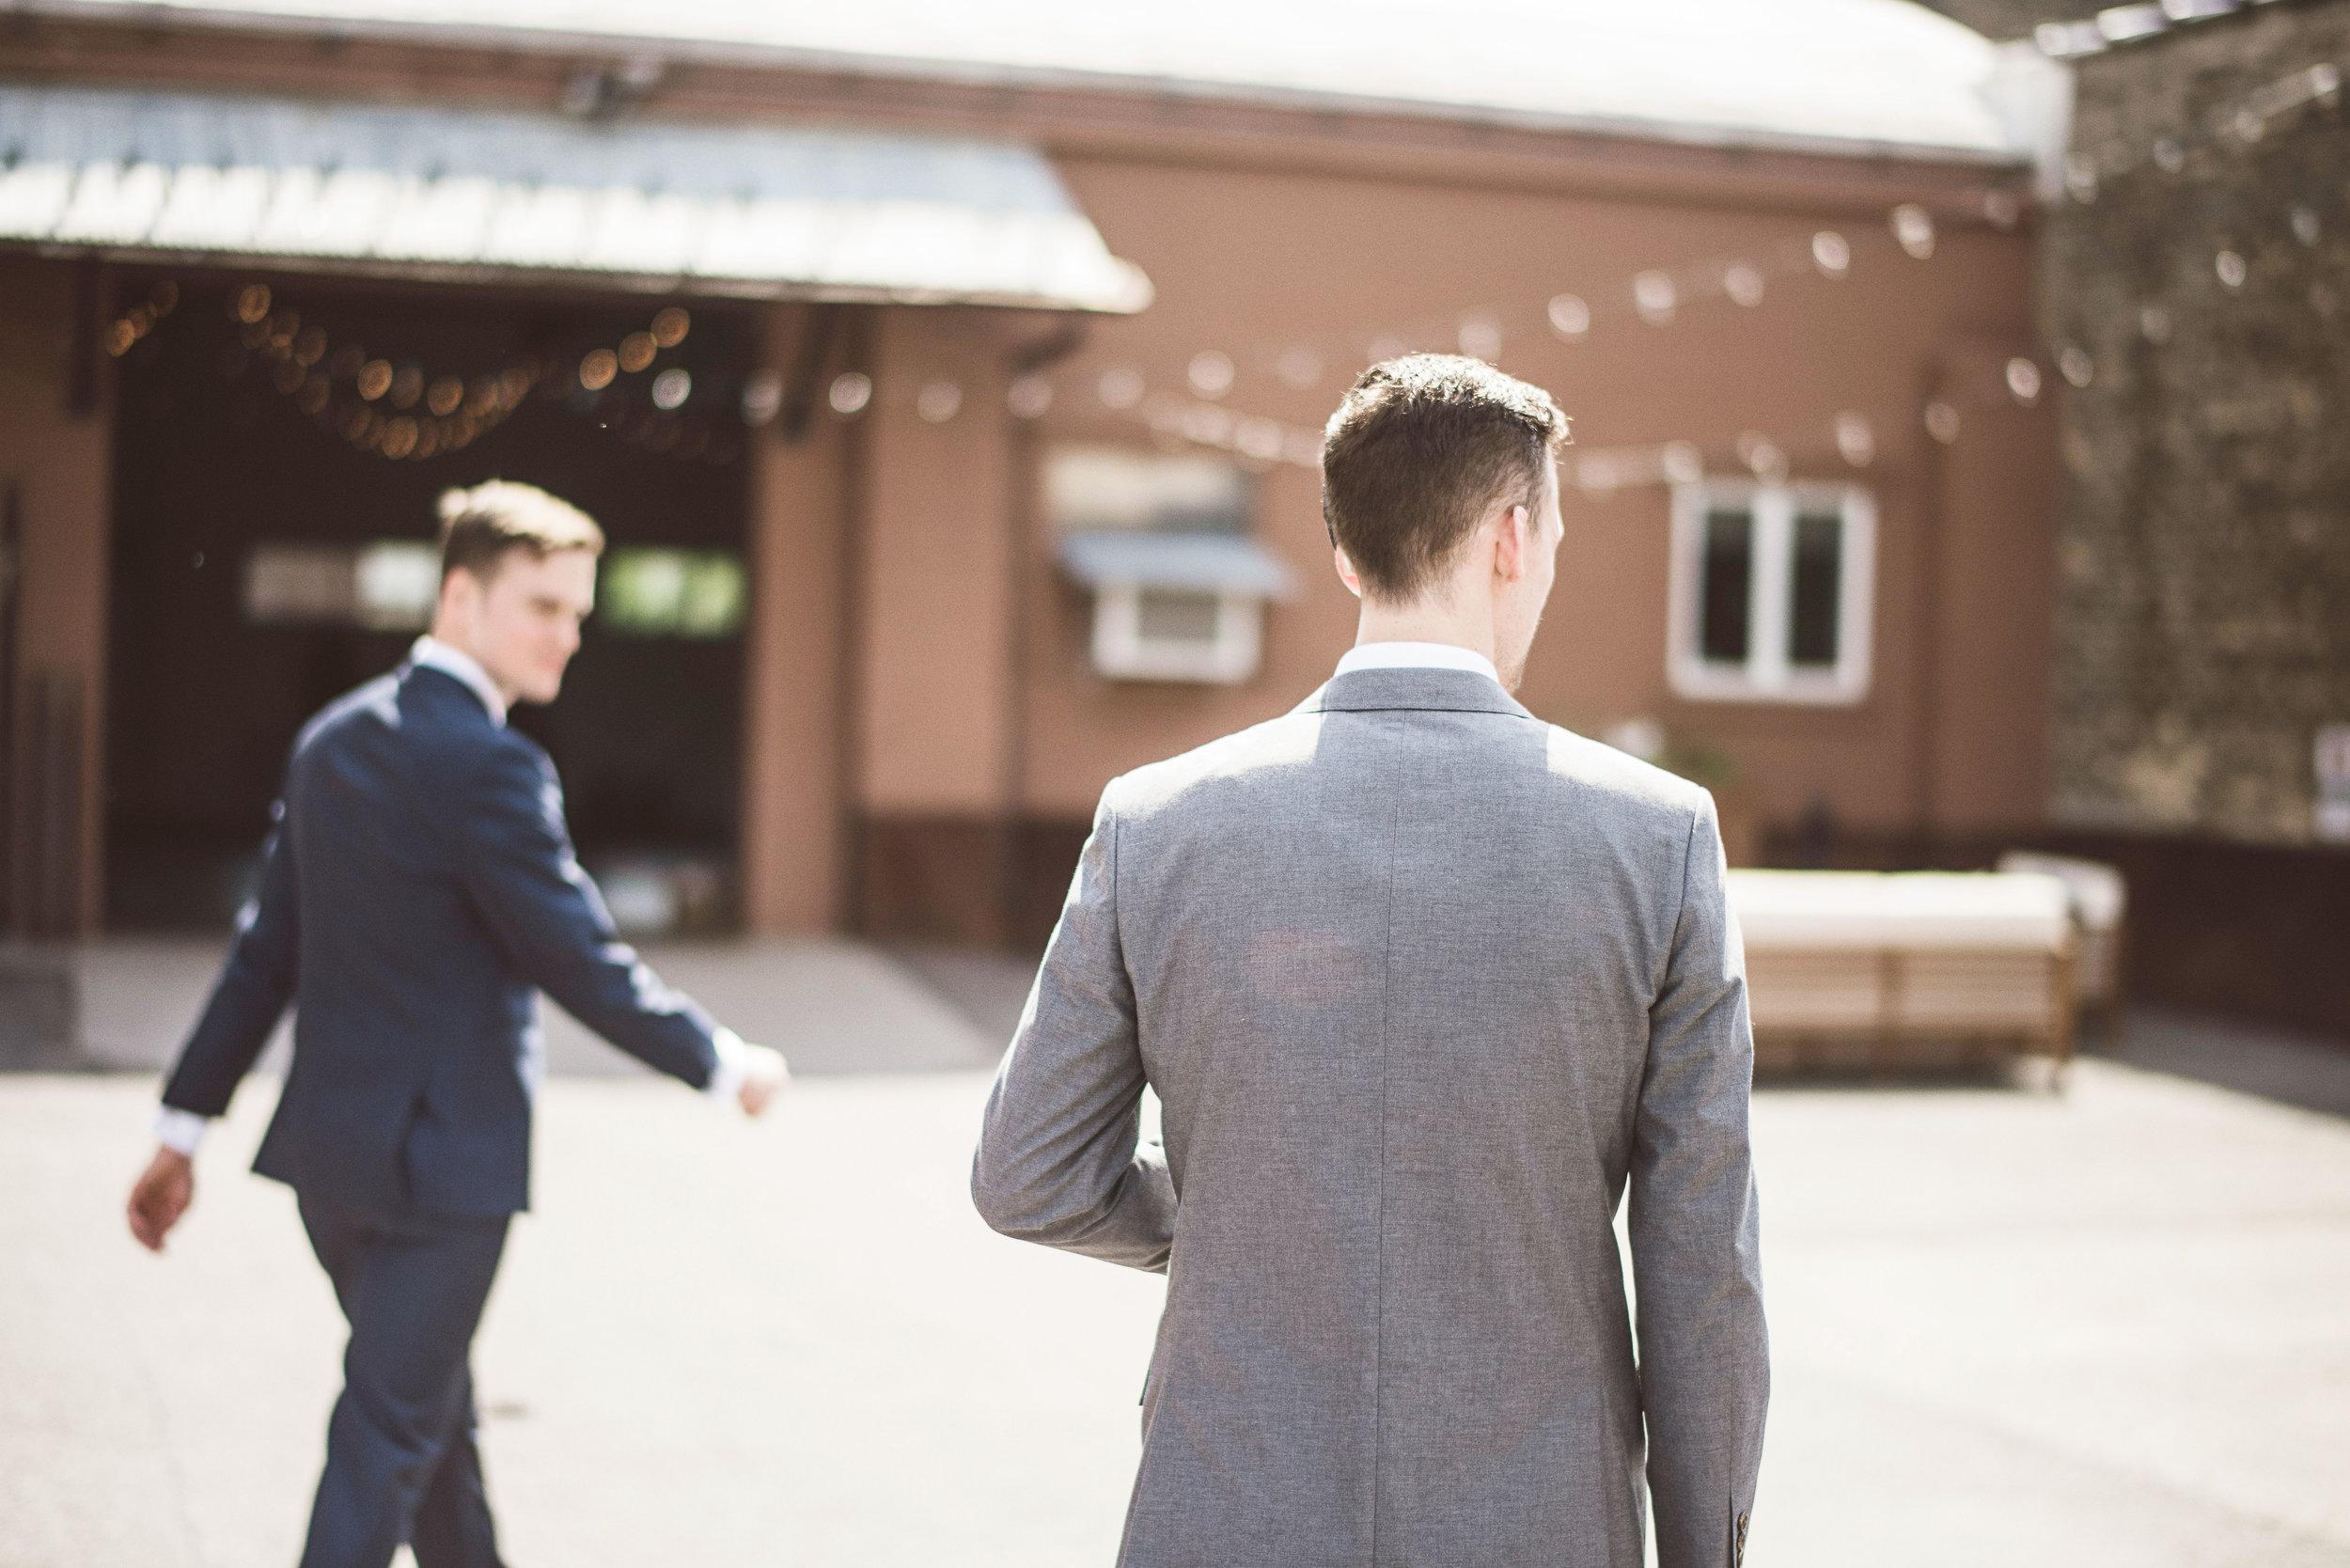 eric_derek_wedding_by_lucas_botz_photography_DSC_0340.jpg